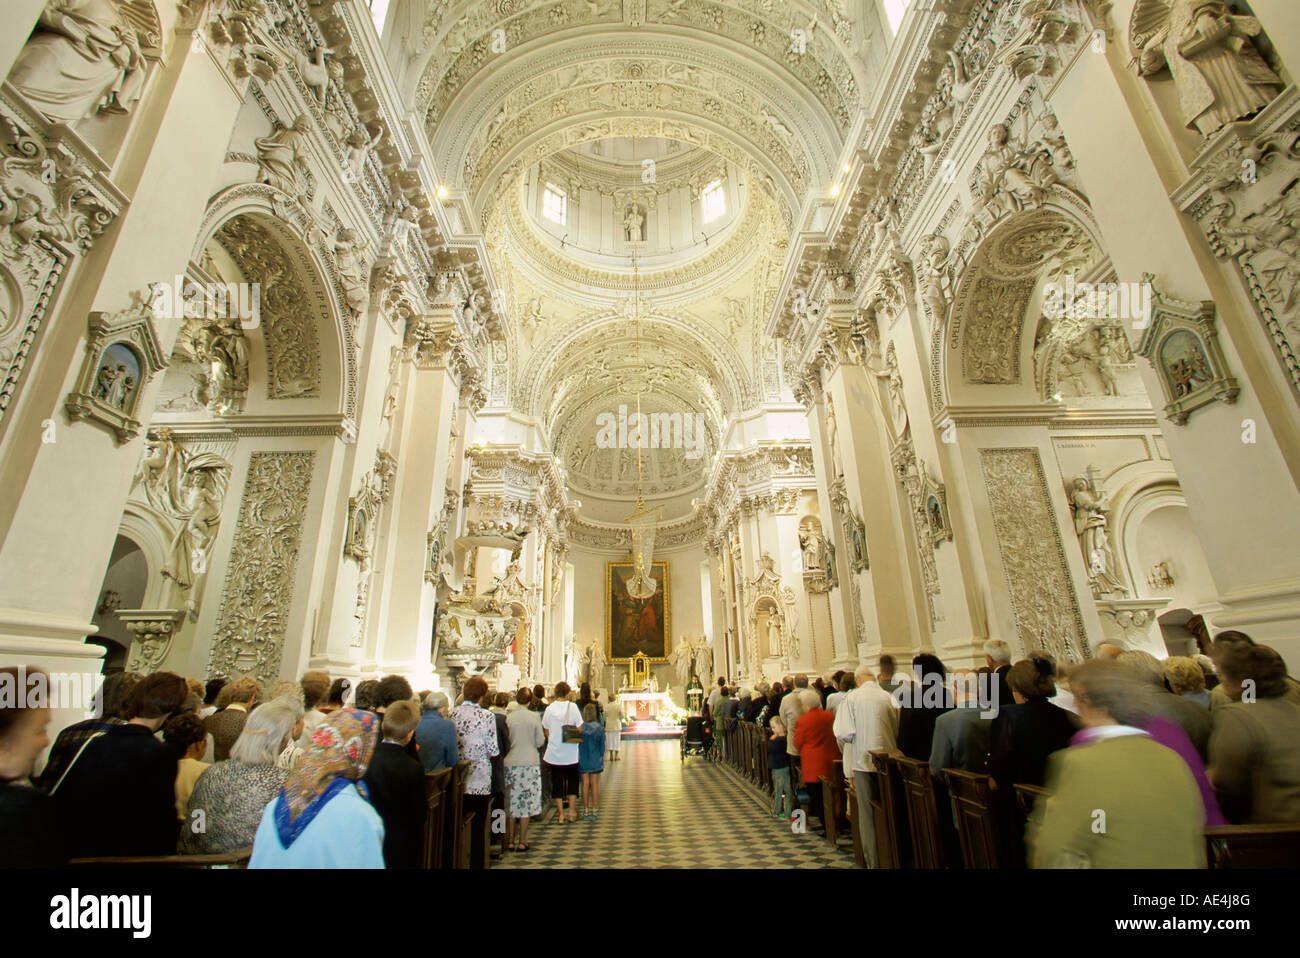 Interieur barock  Barocke Interieur, St. Peter und Paul Kirche, Vilnius, Litauen ...